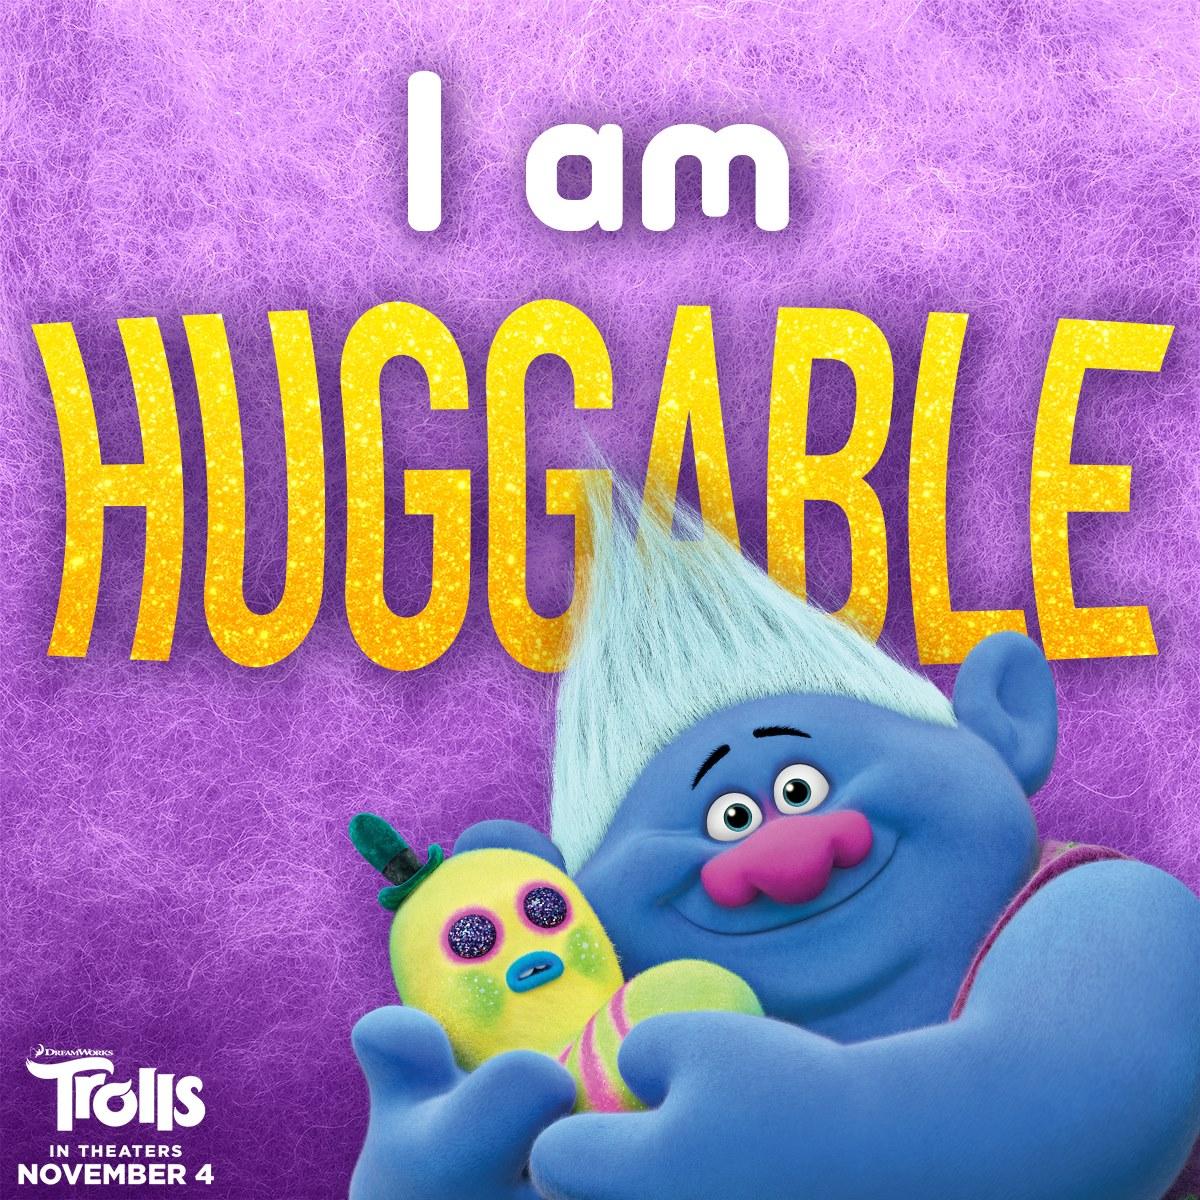 File:Biggie - I am HUGGABLE.jpg